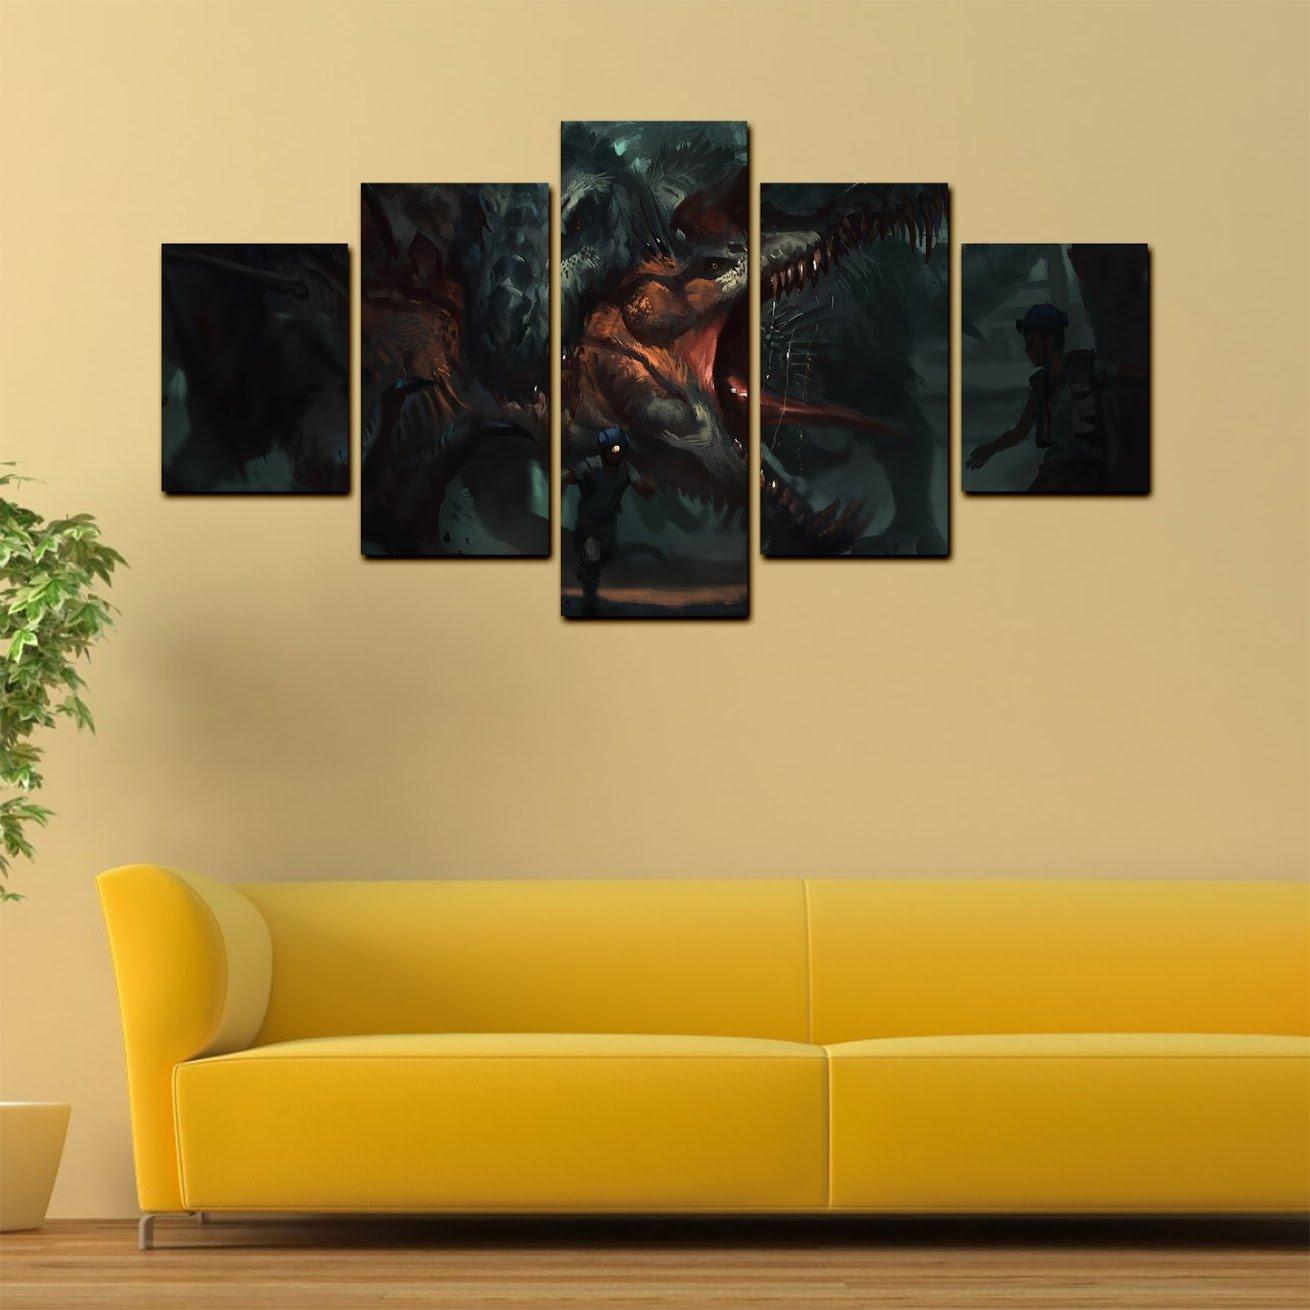 Amazon.com: Dinosaur Canvas Wall Decor - 5 Pieces Wall Art - Oil ...